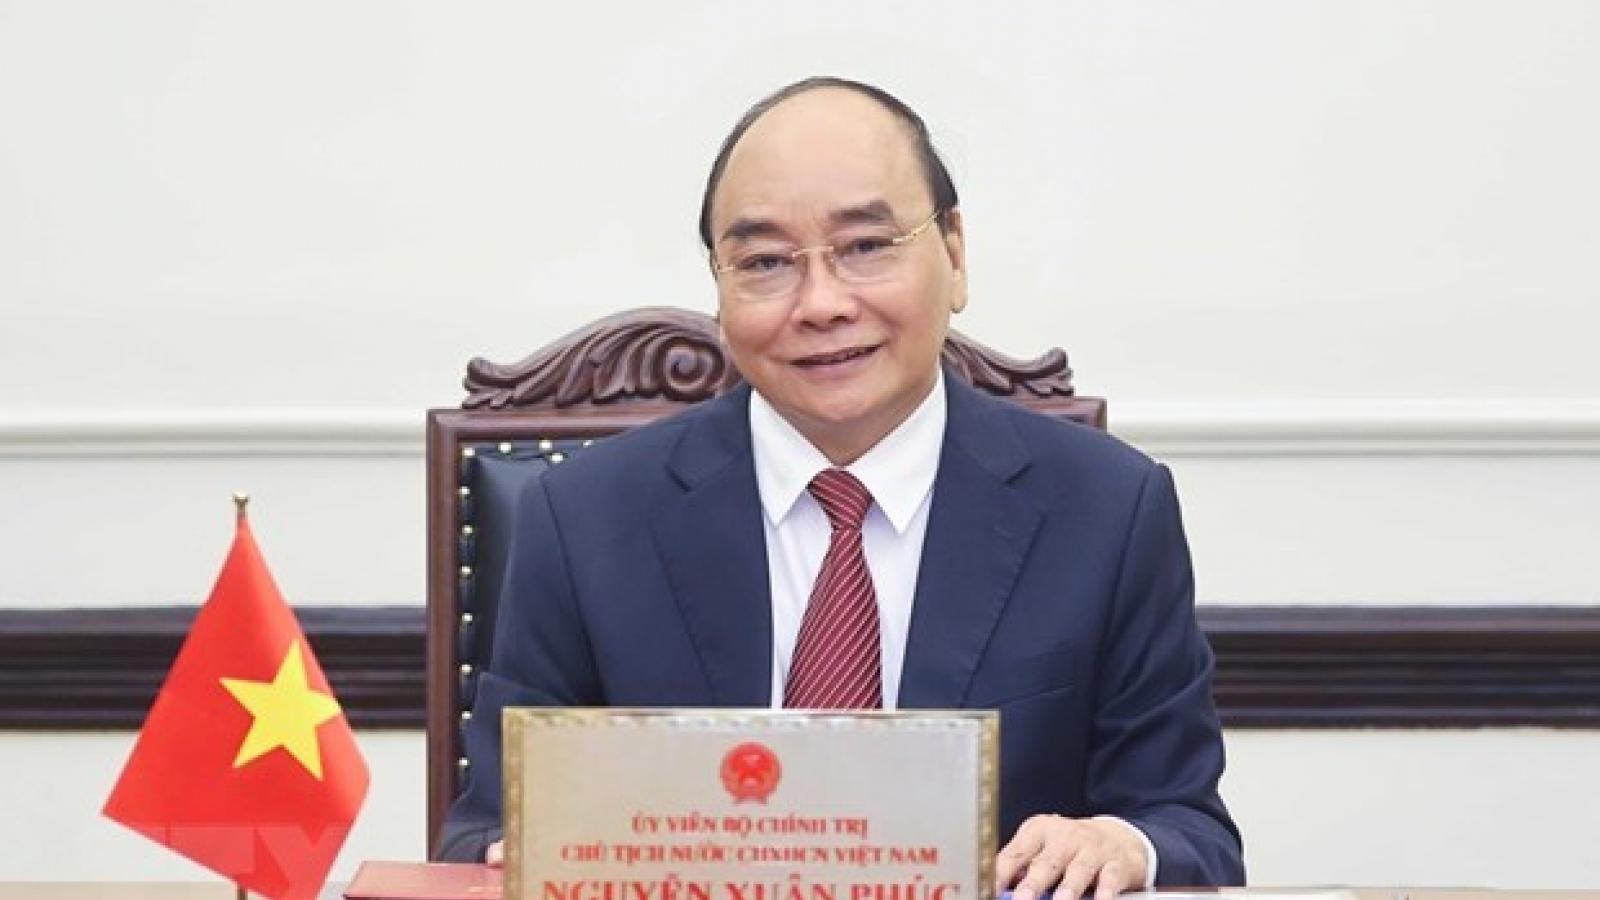 Vietnam – a friend, trustworthy partner of international community